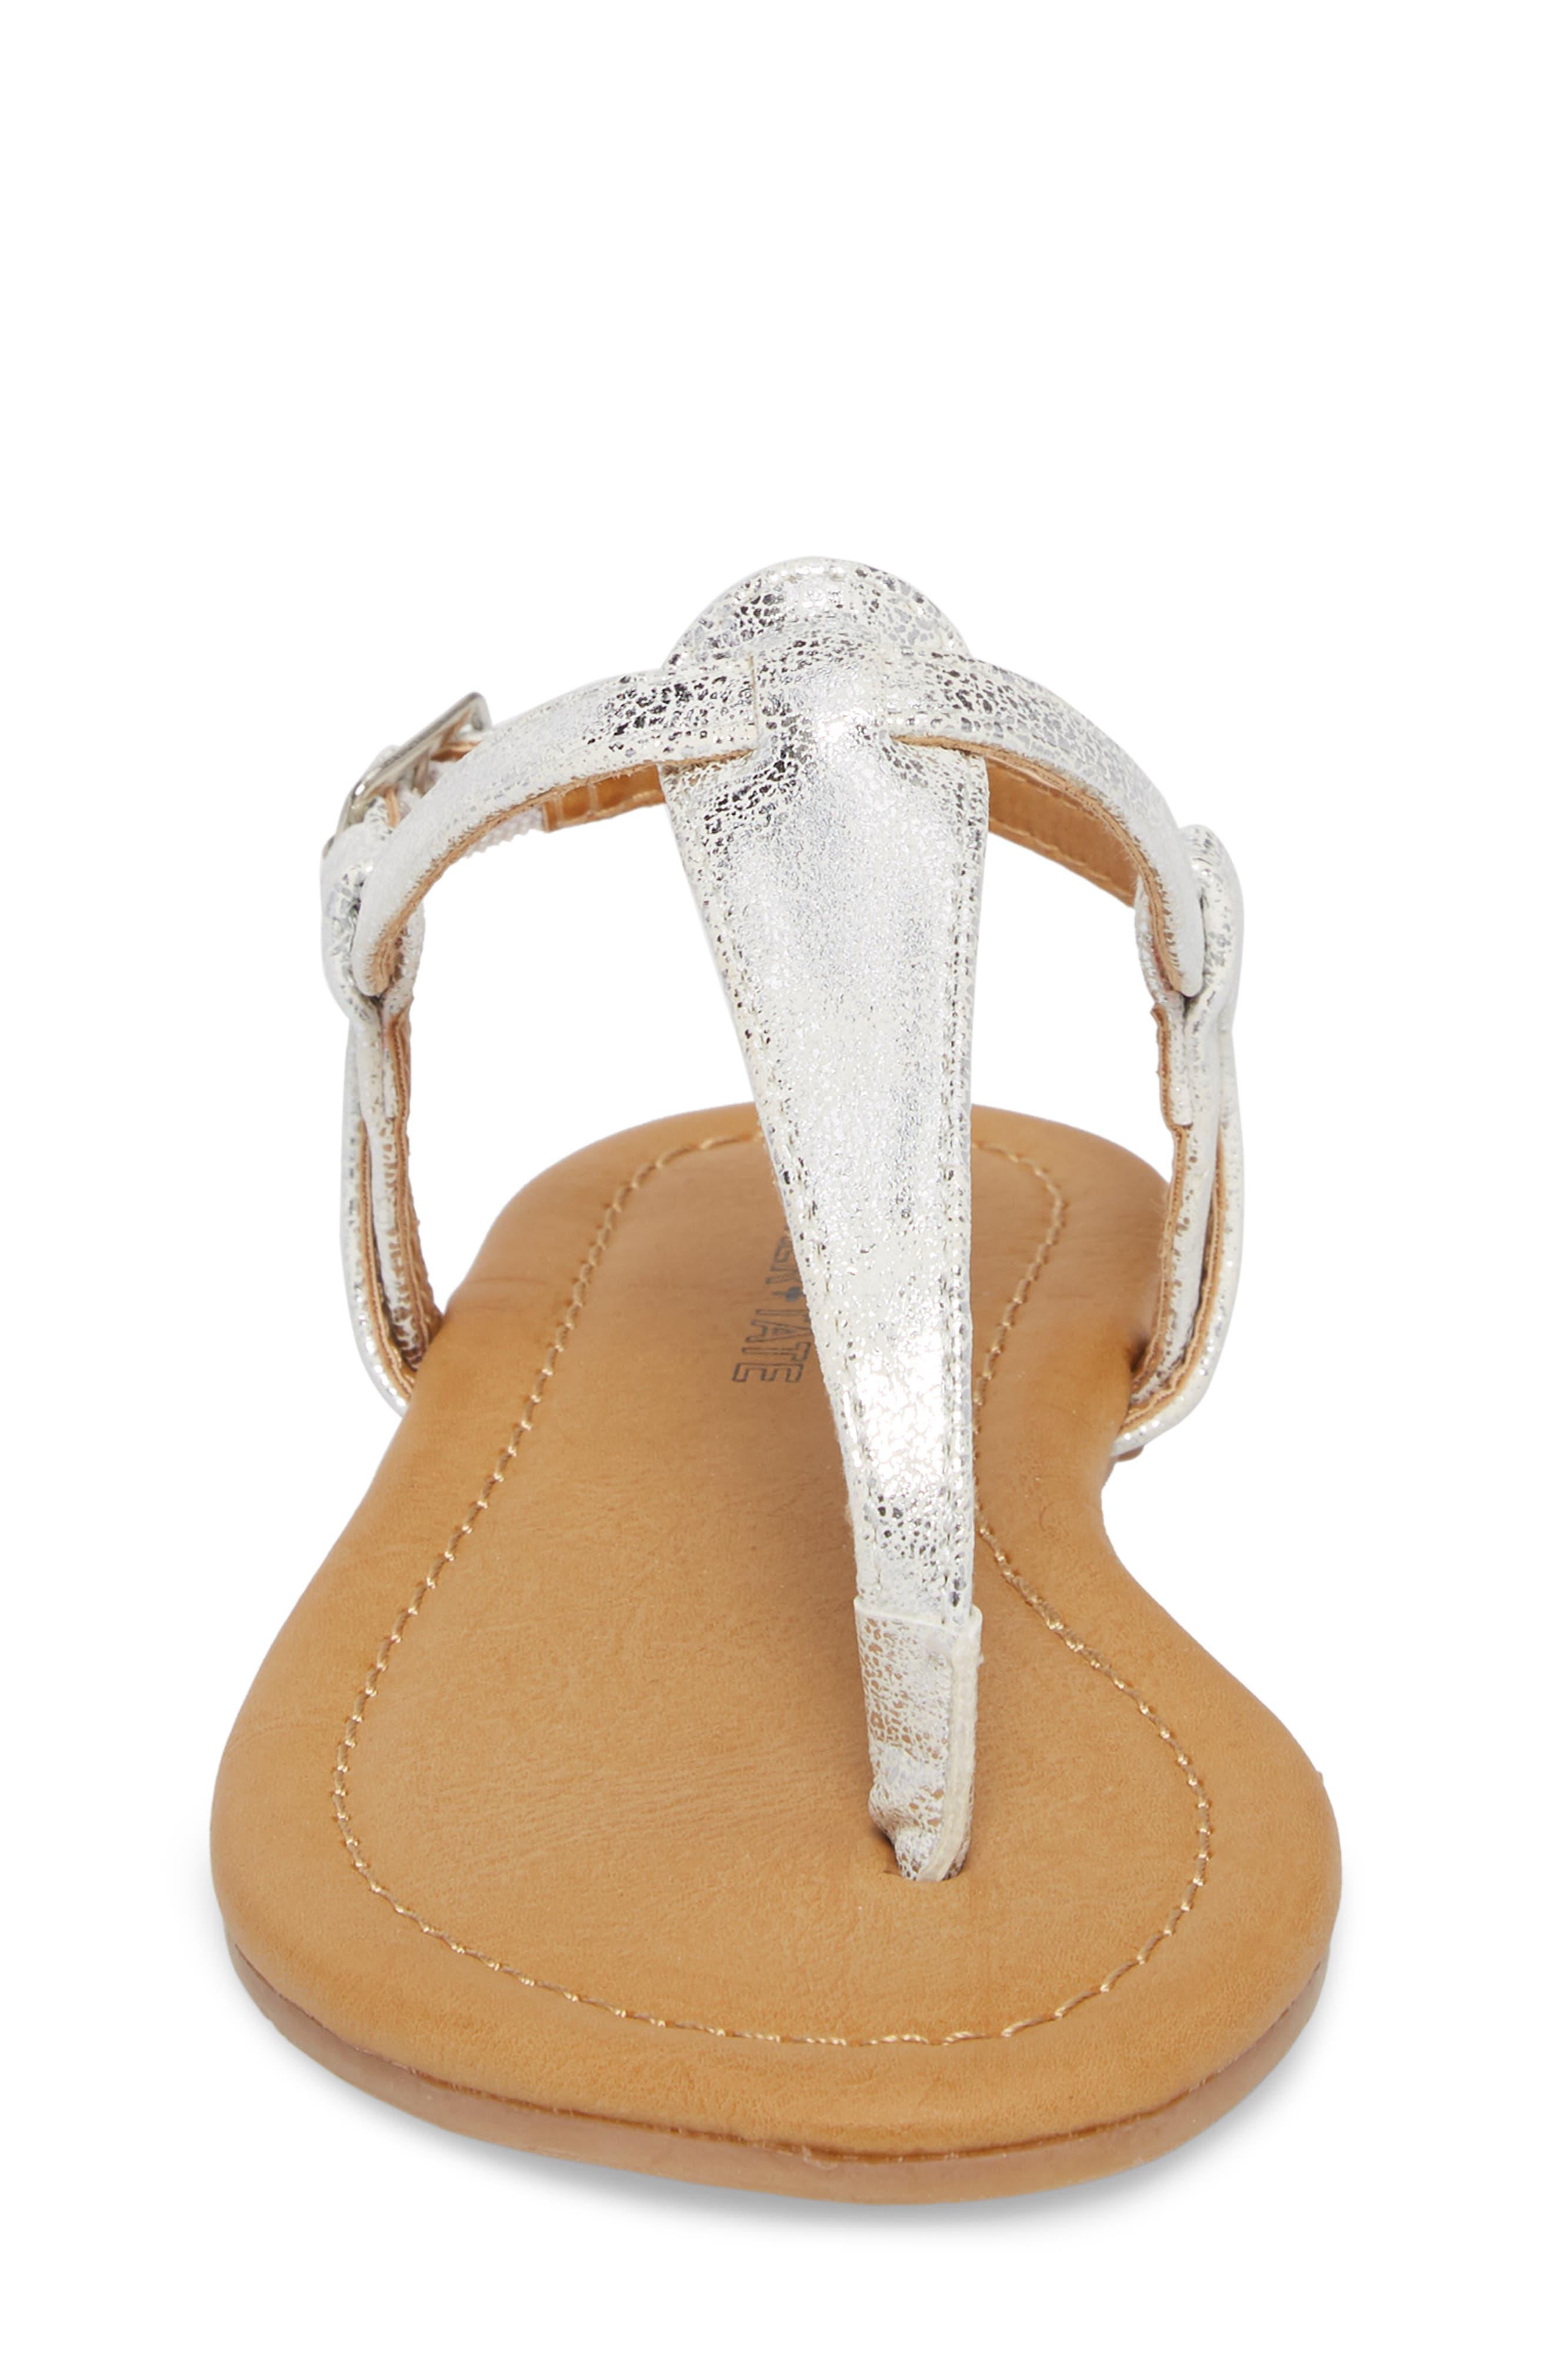 Lizzie Sandal,                             Alternate thumbnail 4, color,                             White/ Silver Faux Leather